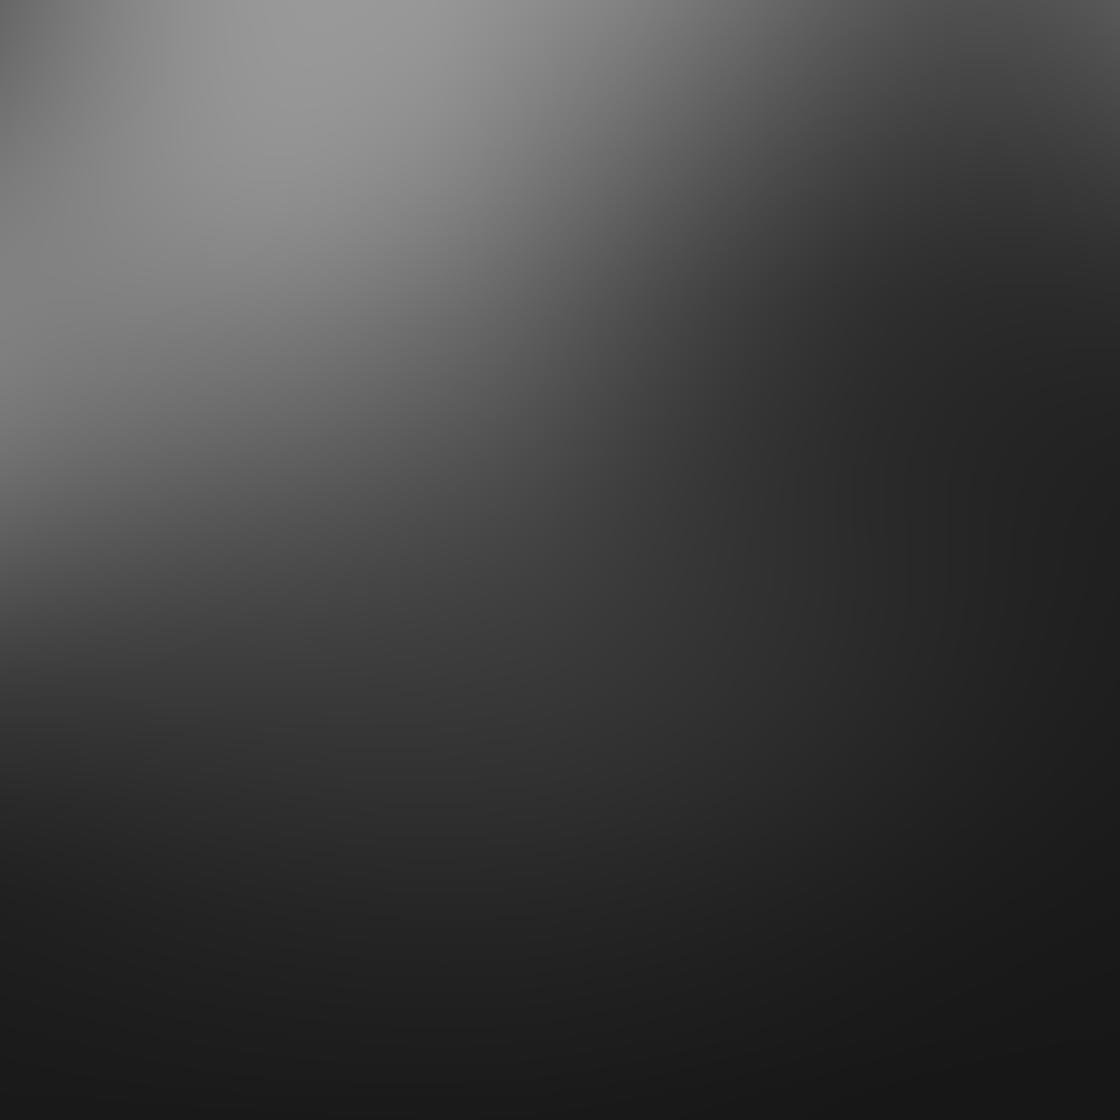 Black & White iPhone Portrait Photos 14